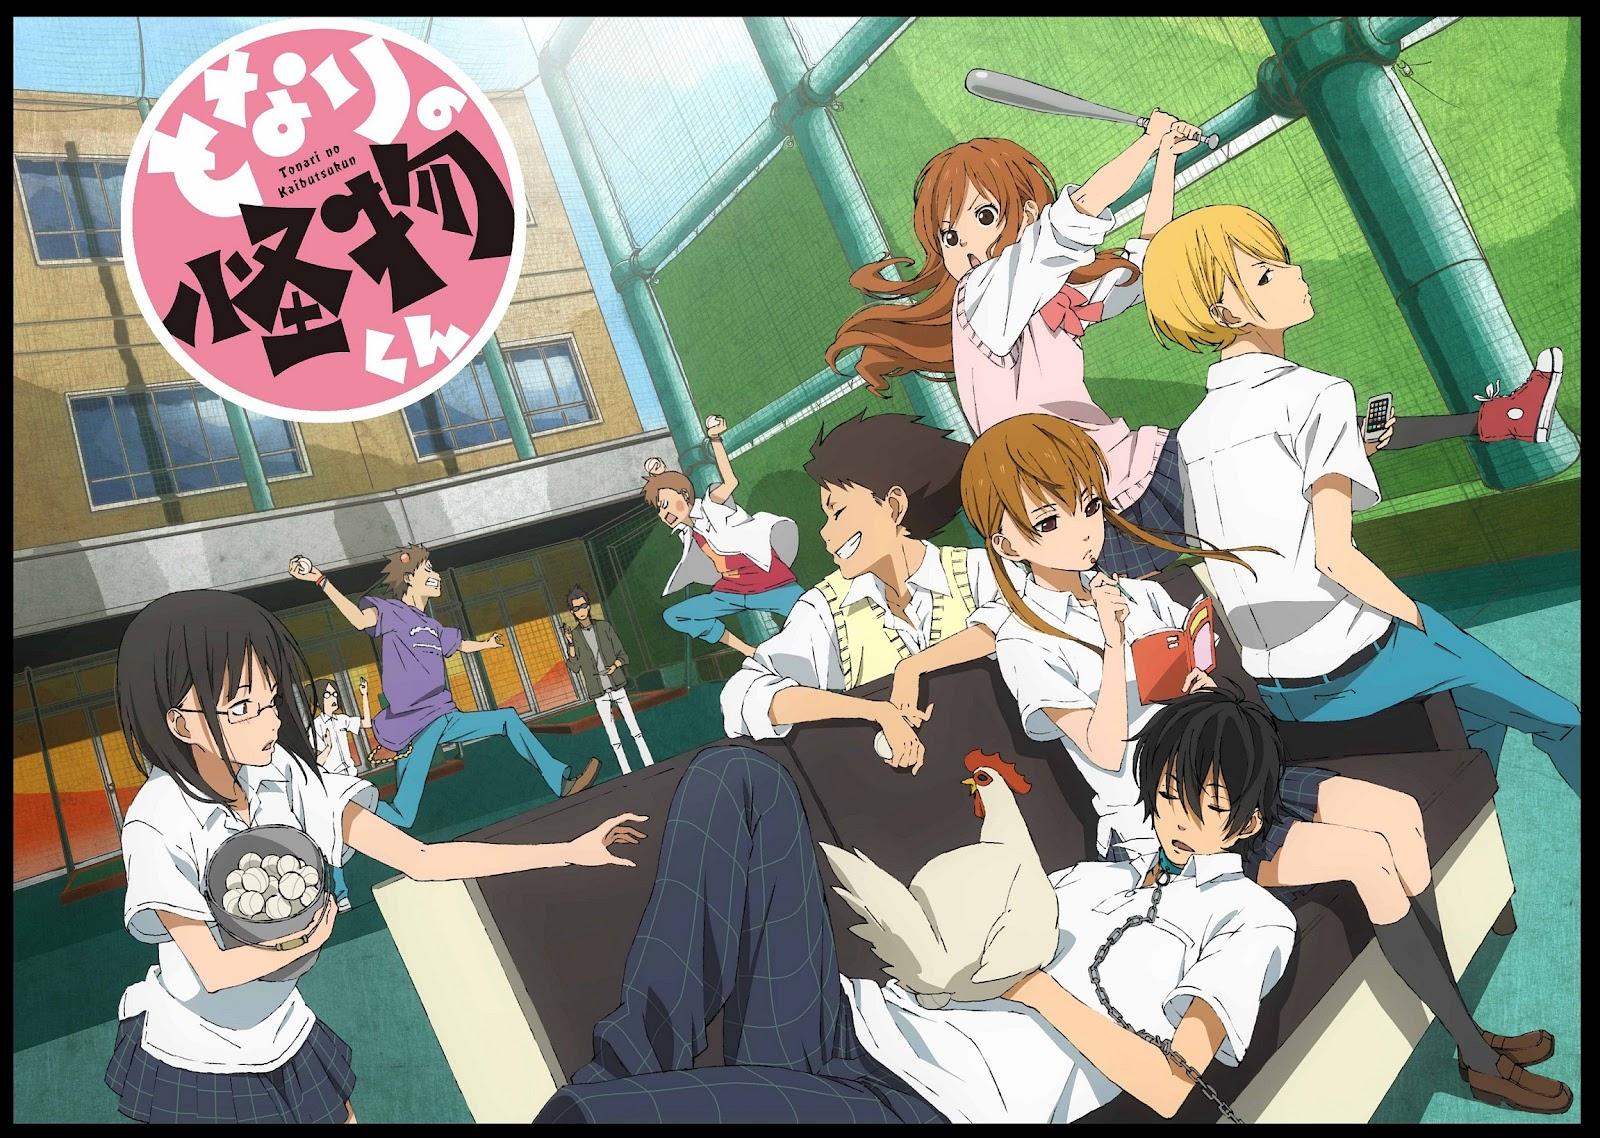 Phi Stars Tonari No Kaibutsu Kun Second Anime Review